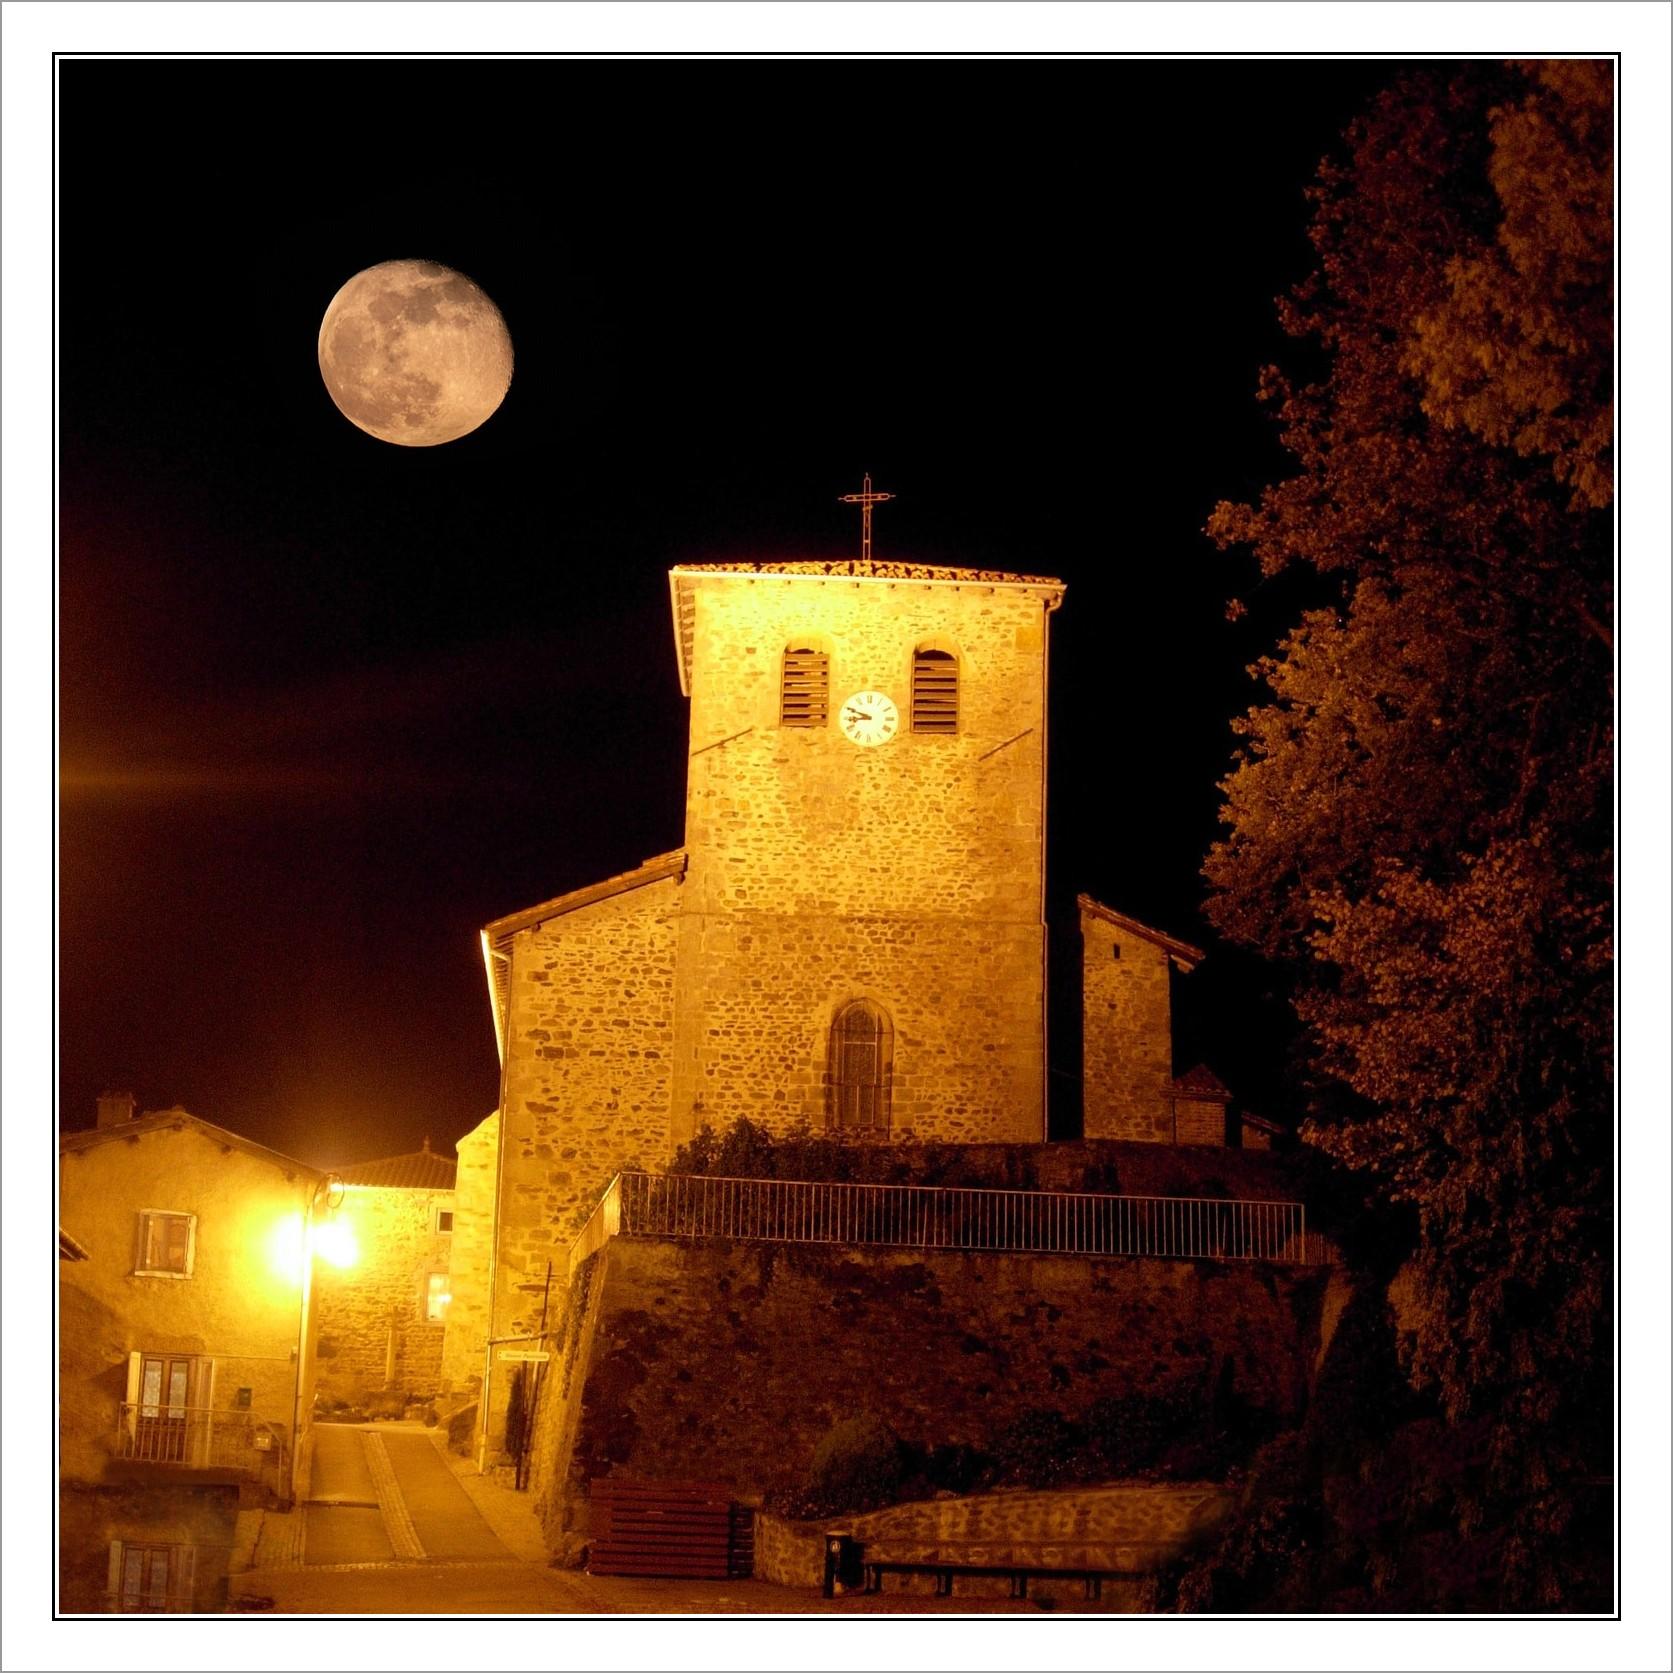 Eglise de nuit et la lune-nano-BorderMaker.jpg